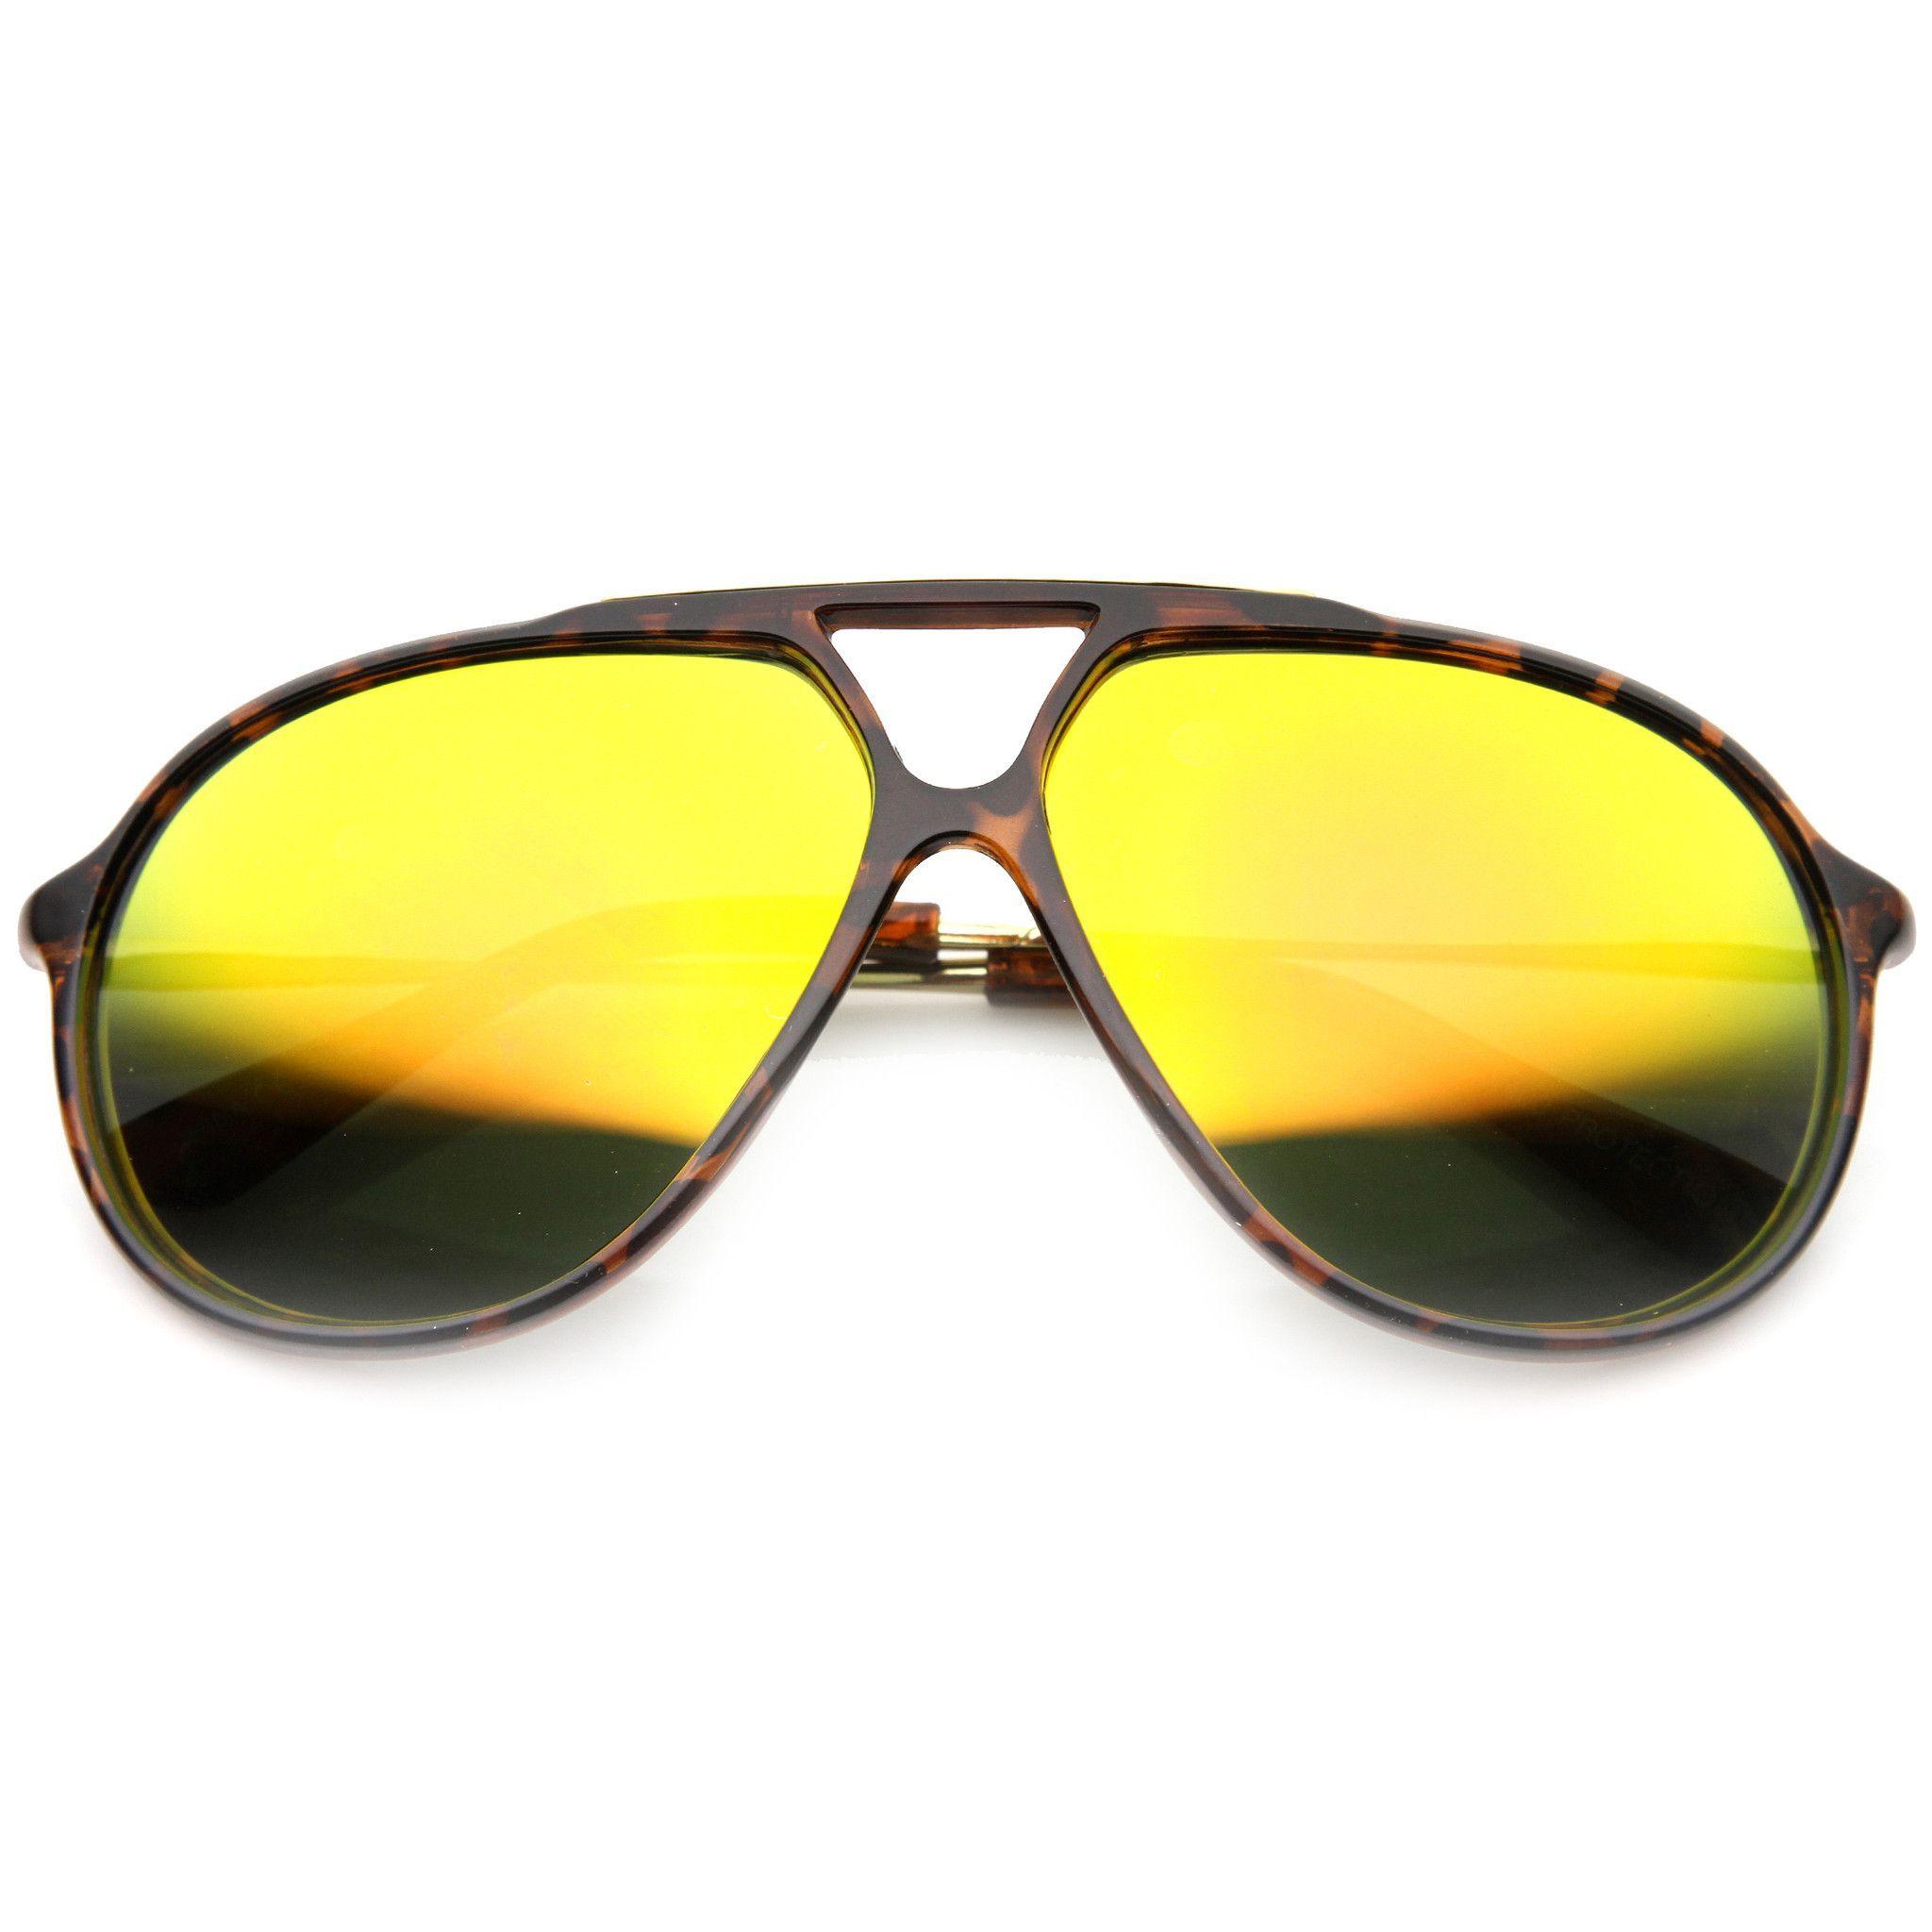 cdaa200c0ca9d0 Large Retro Aviator Sunglasses With Flash Mirror Lenses 9740 ...